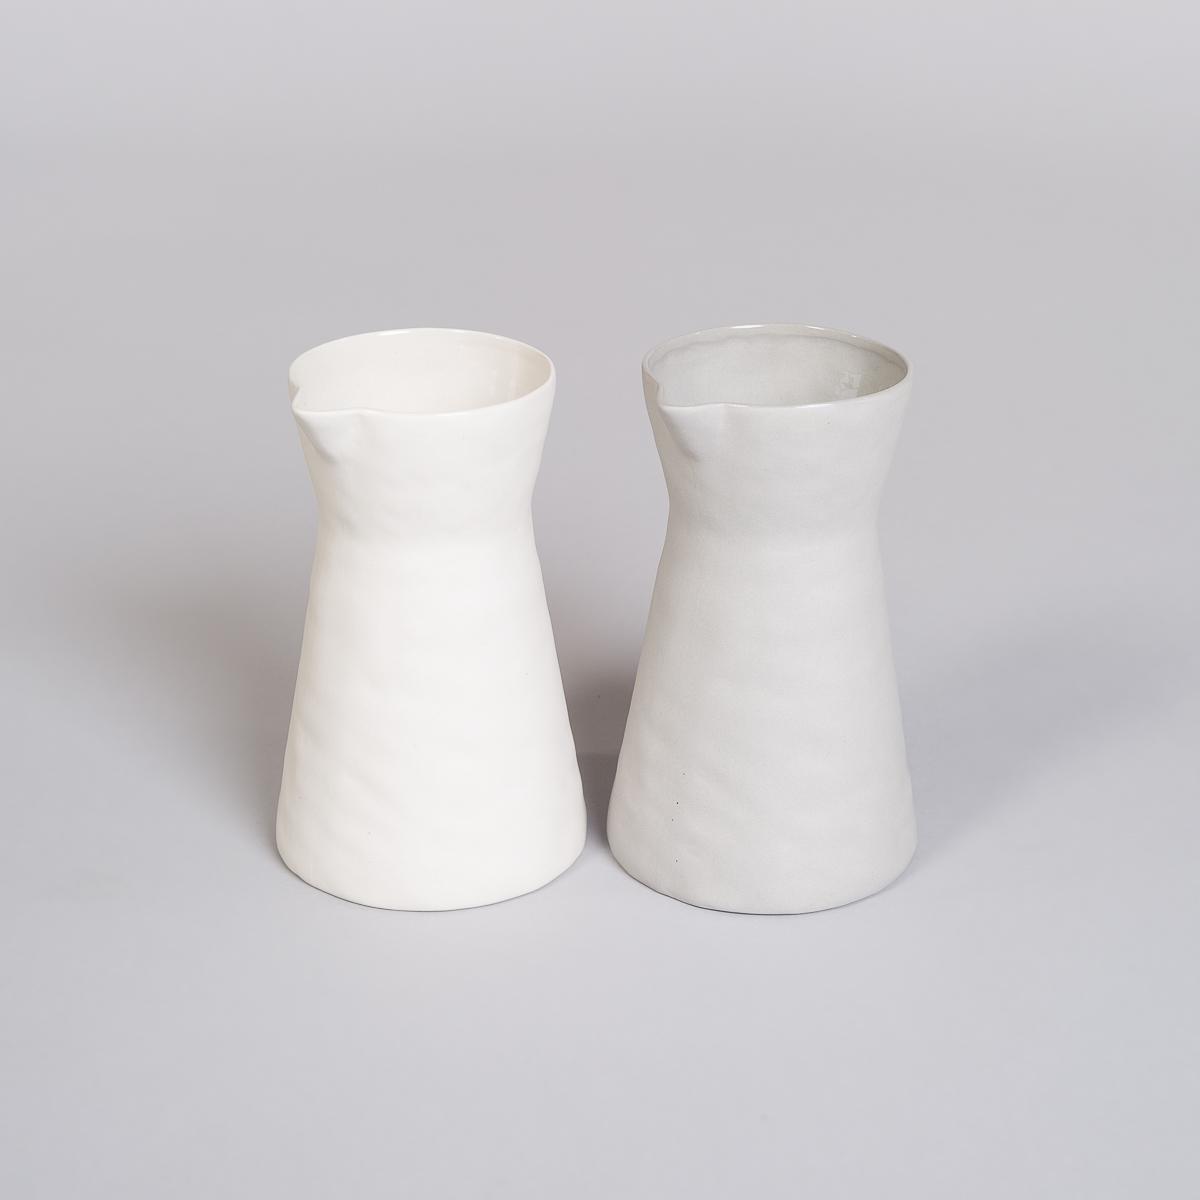 Mugge i Porselen - Kremfarget-260